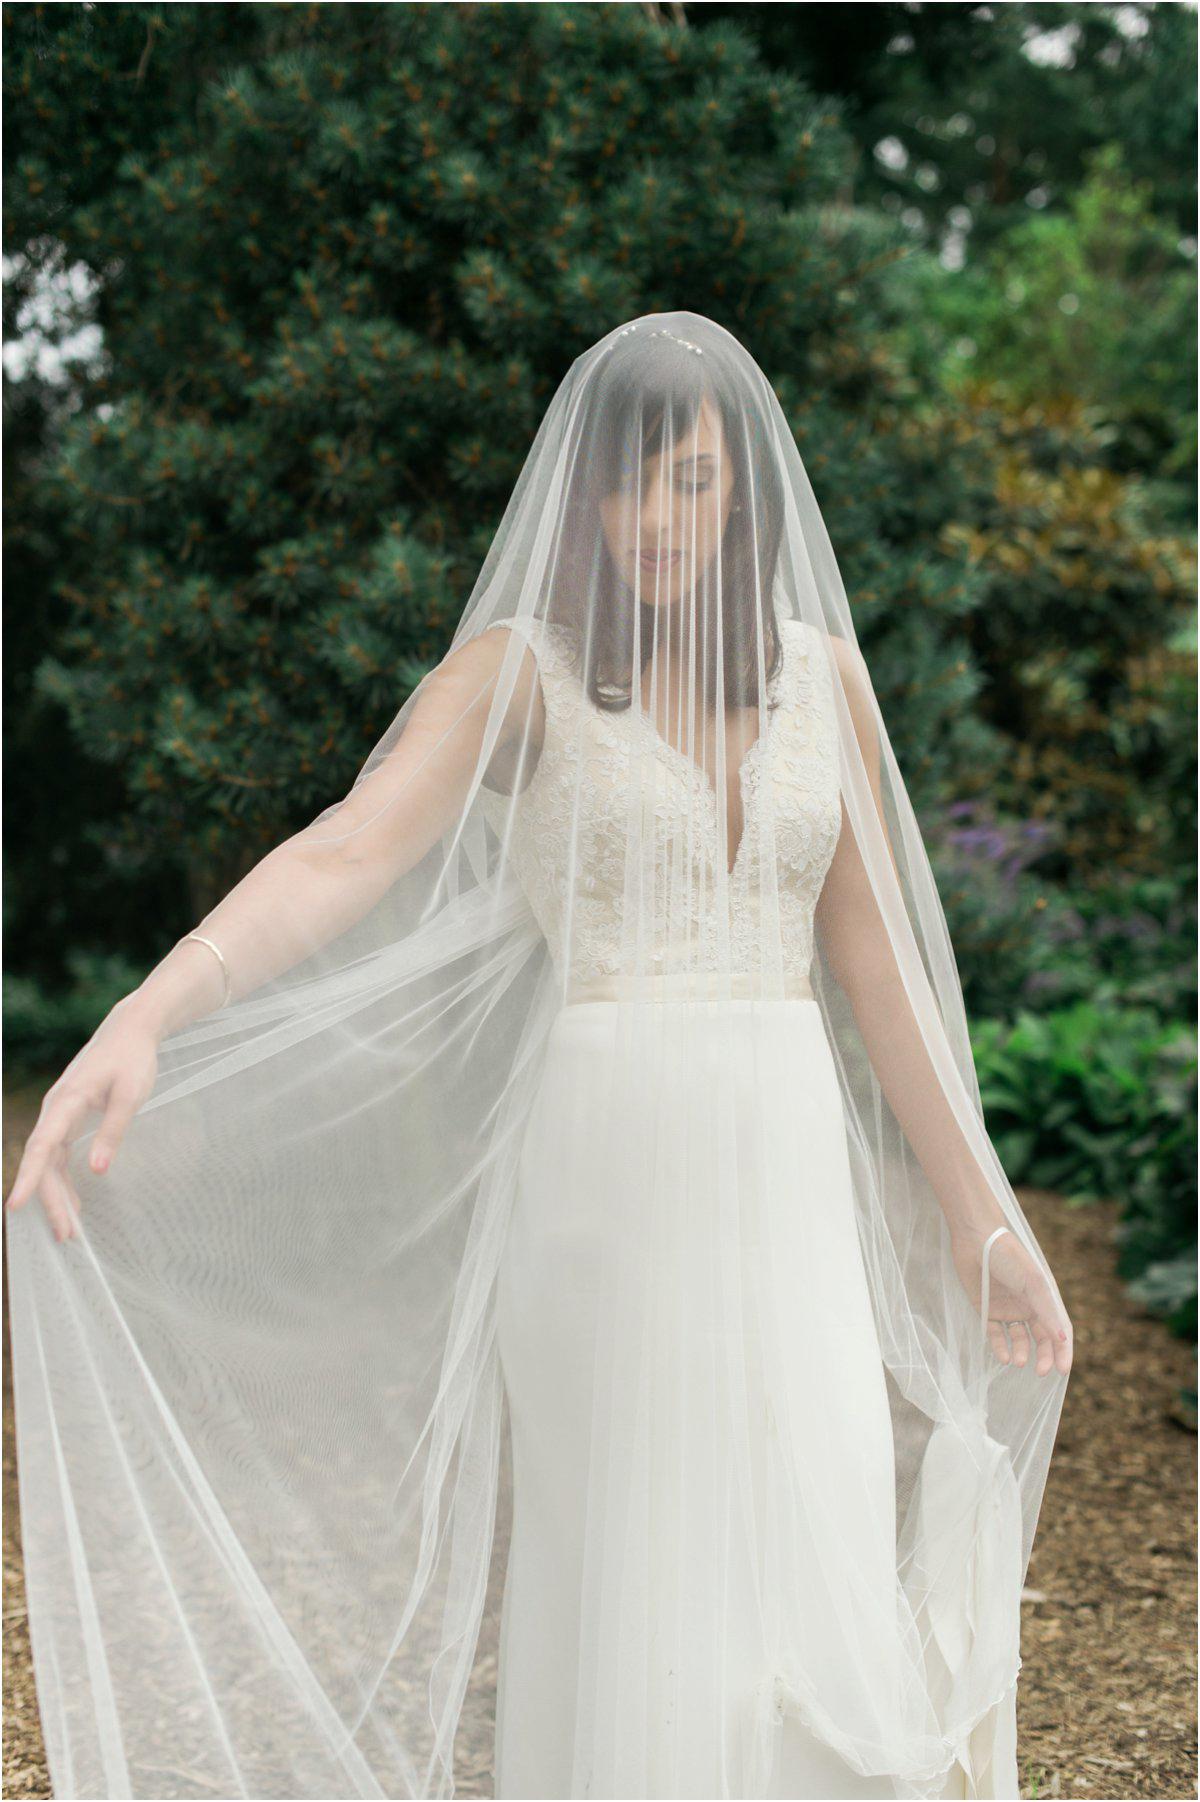 Crofts & Kowalczyk Best Wedding Photography Scotland Blogpost-164.jpg